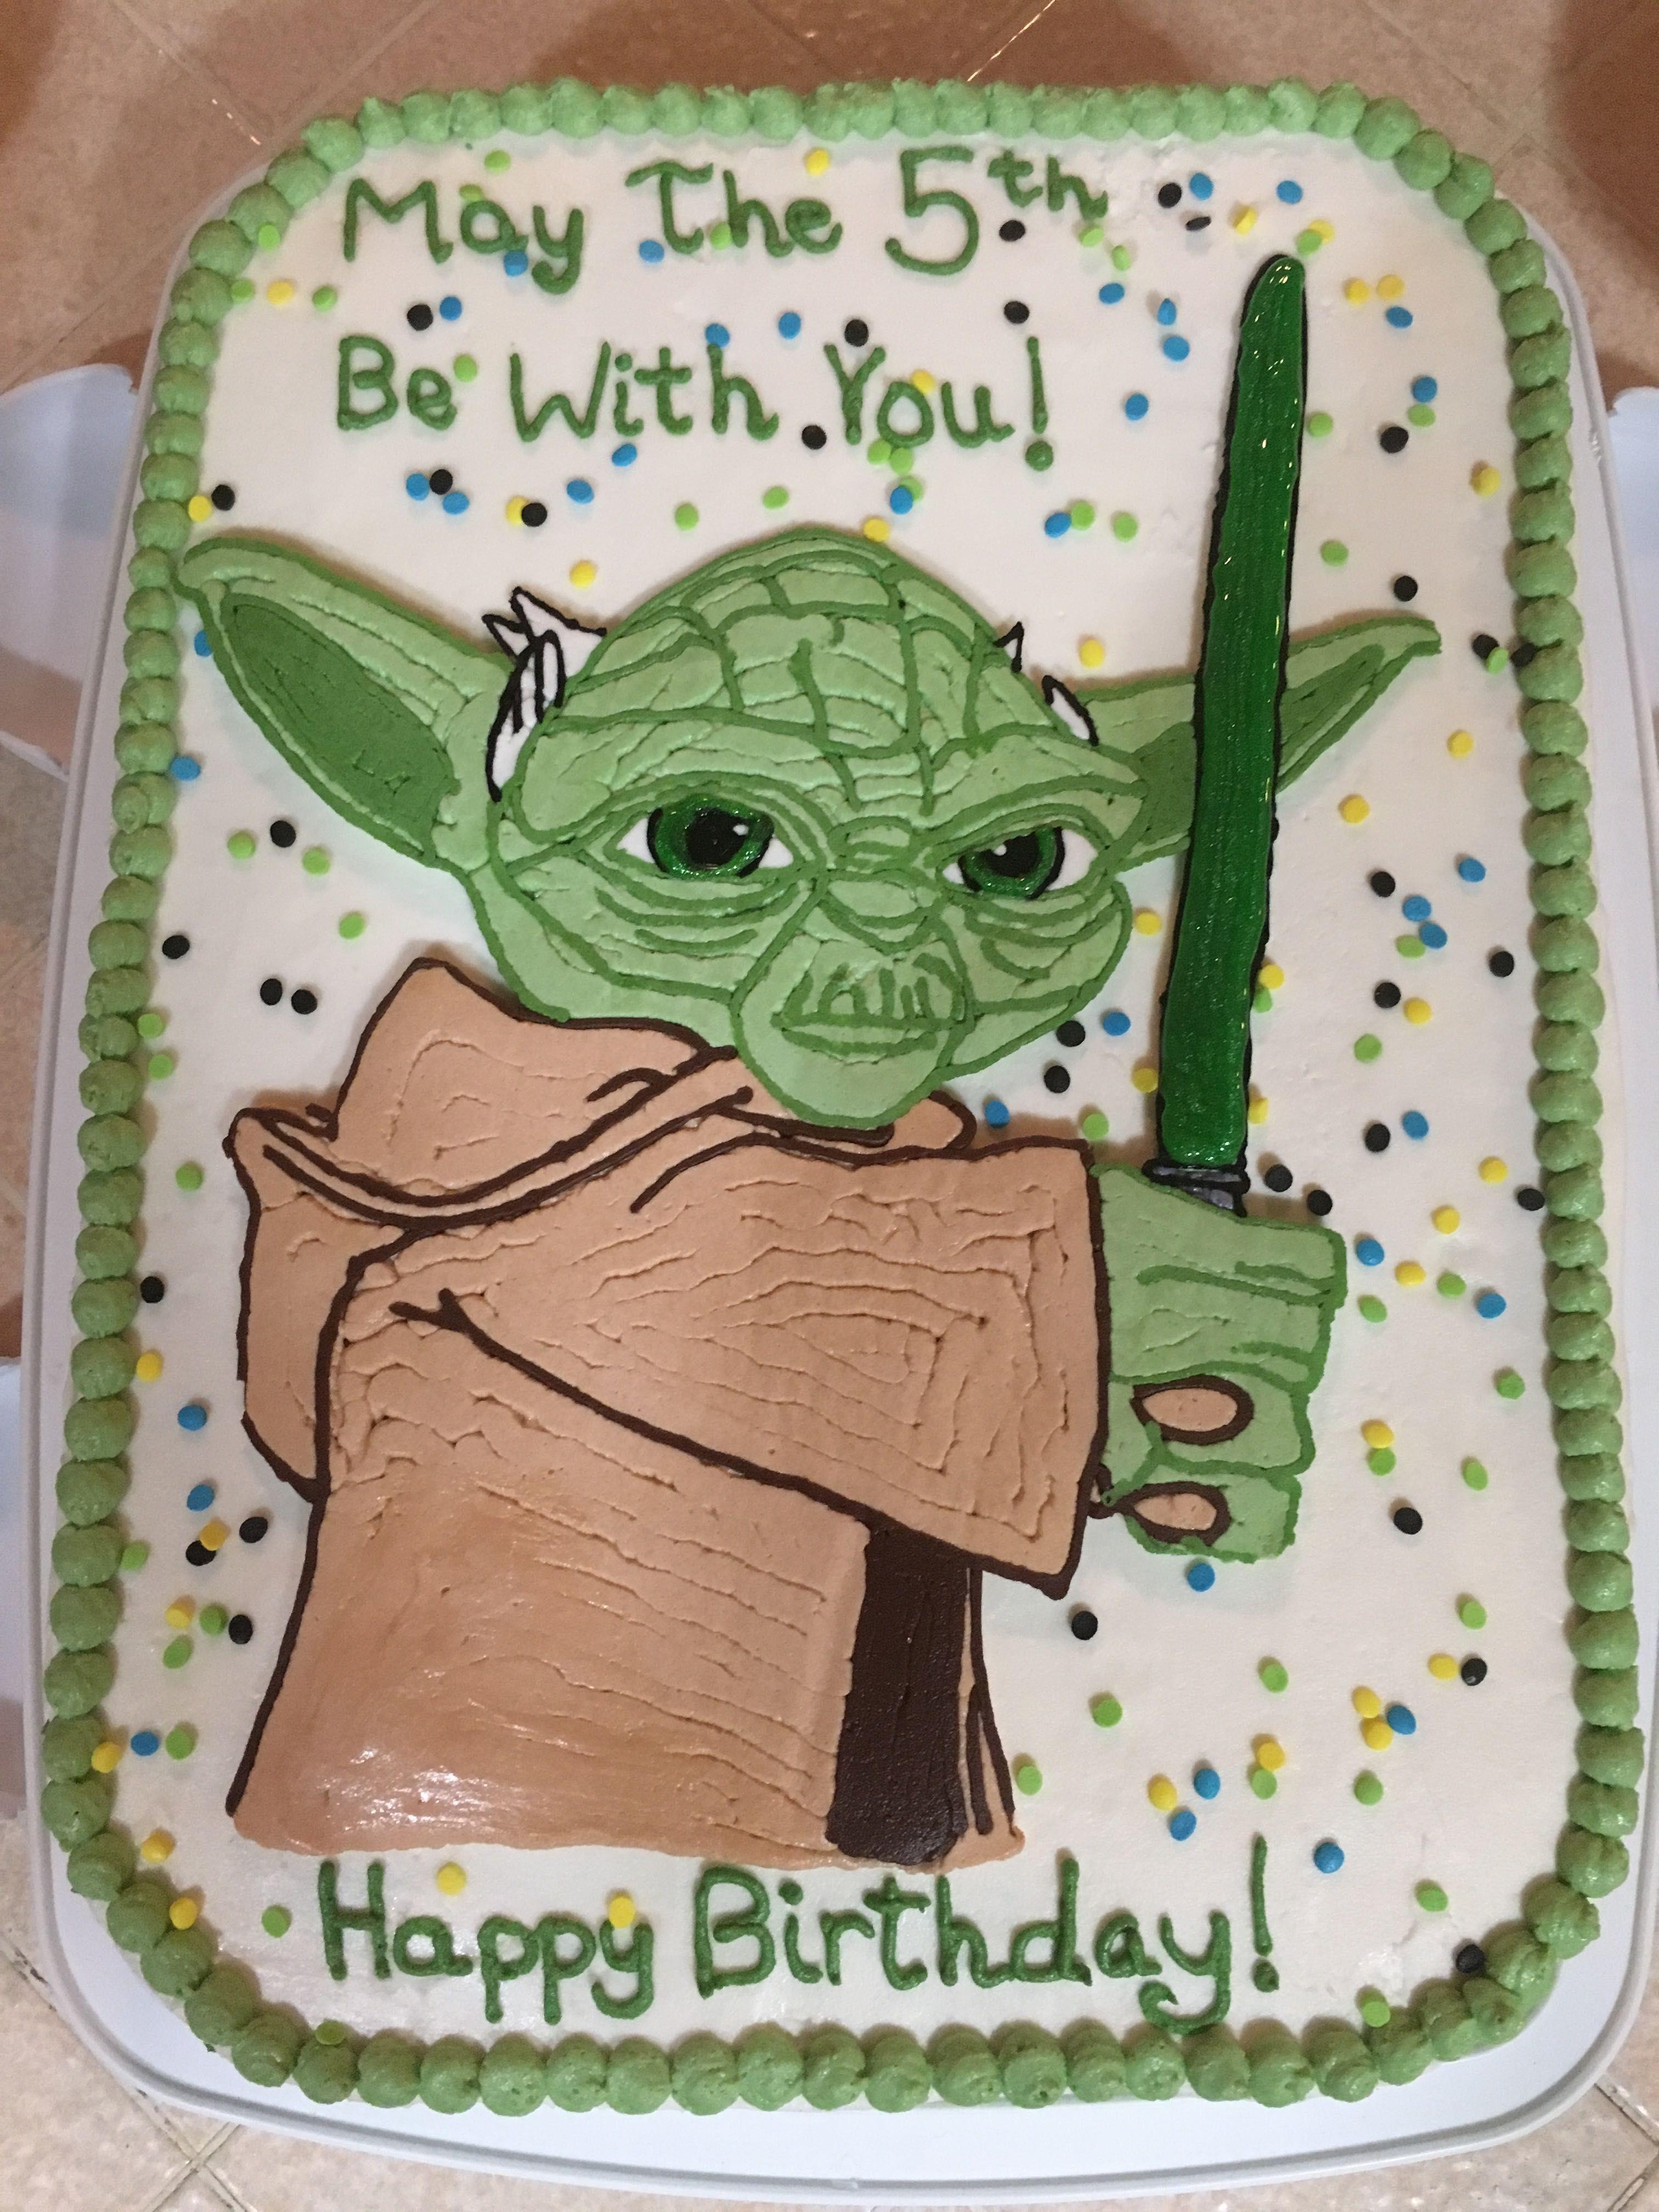 Star Wars Yoda Cake With Buttercream Tracing Method Same As My Paw